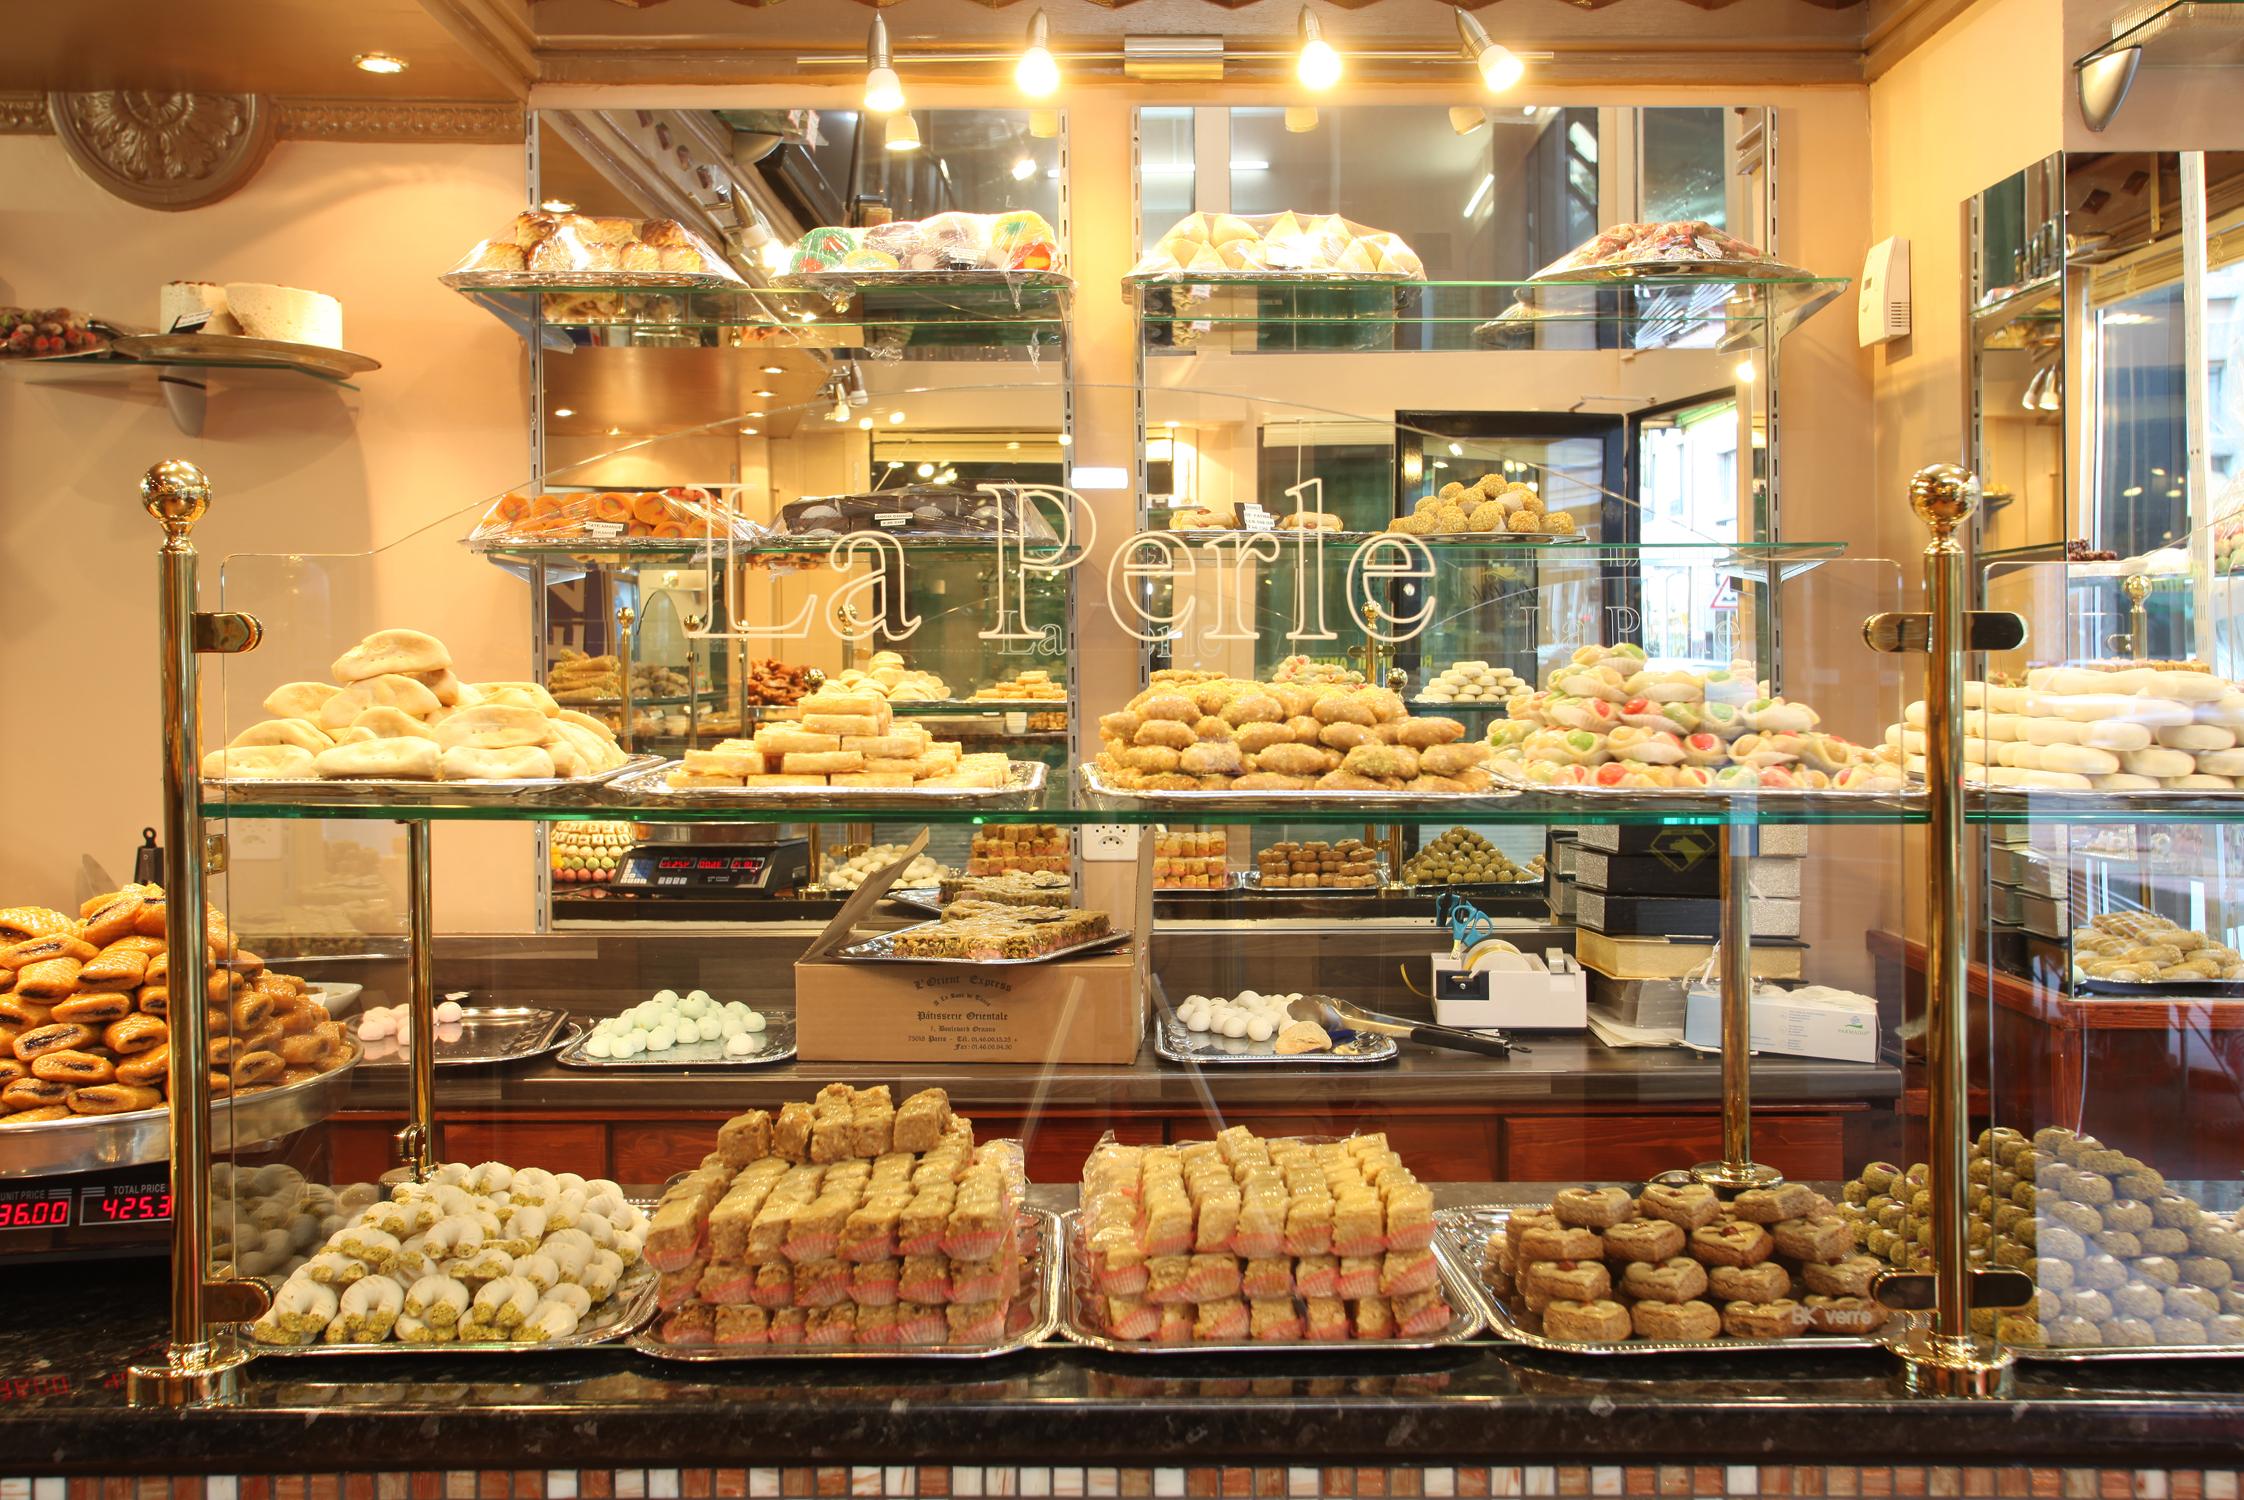 Harmony Pastry Shop & Cafe